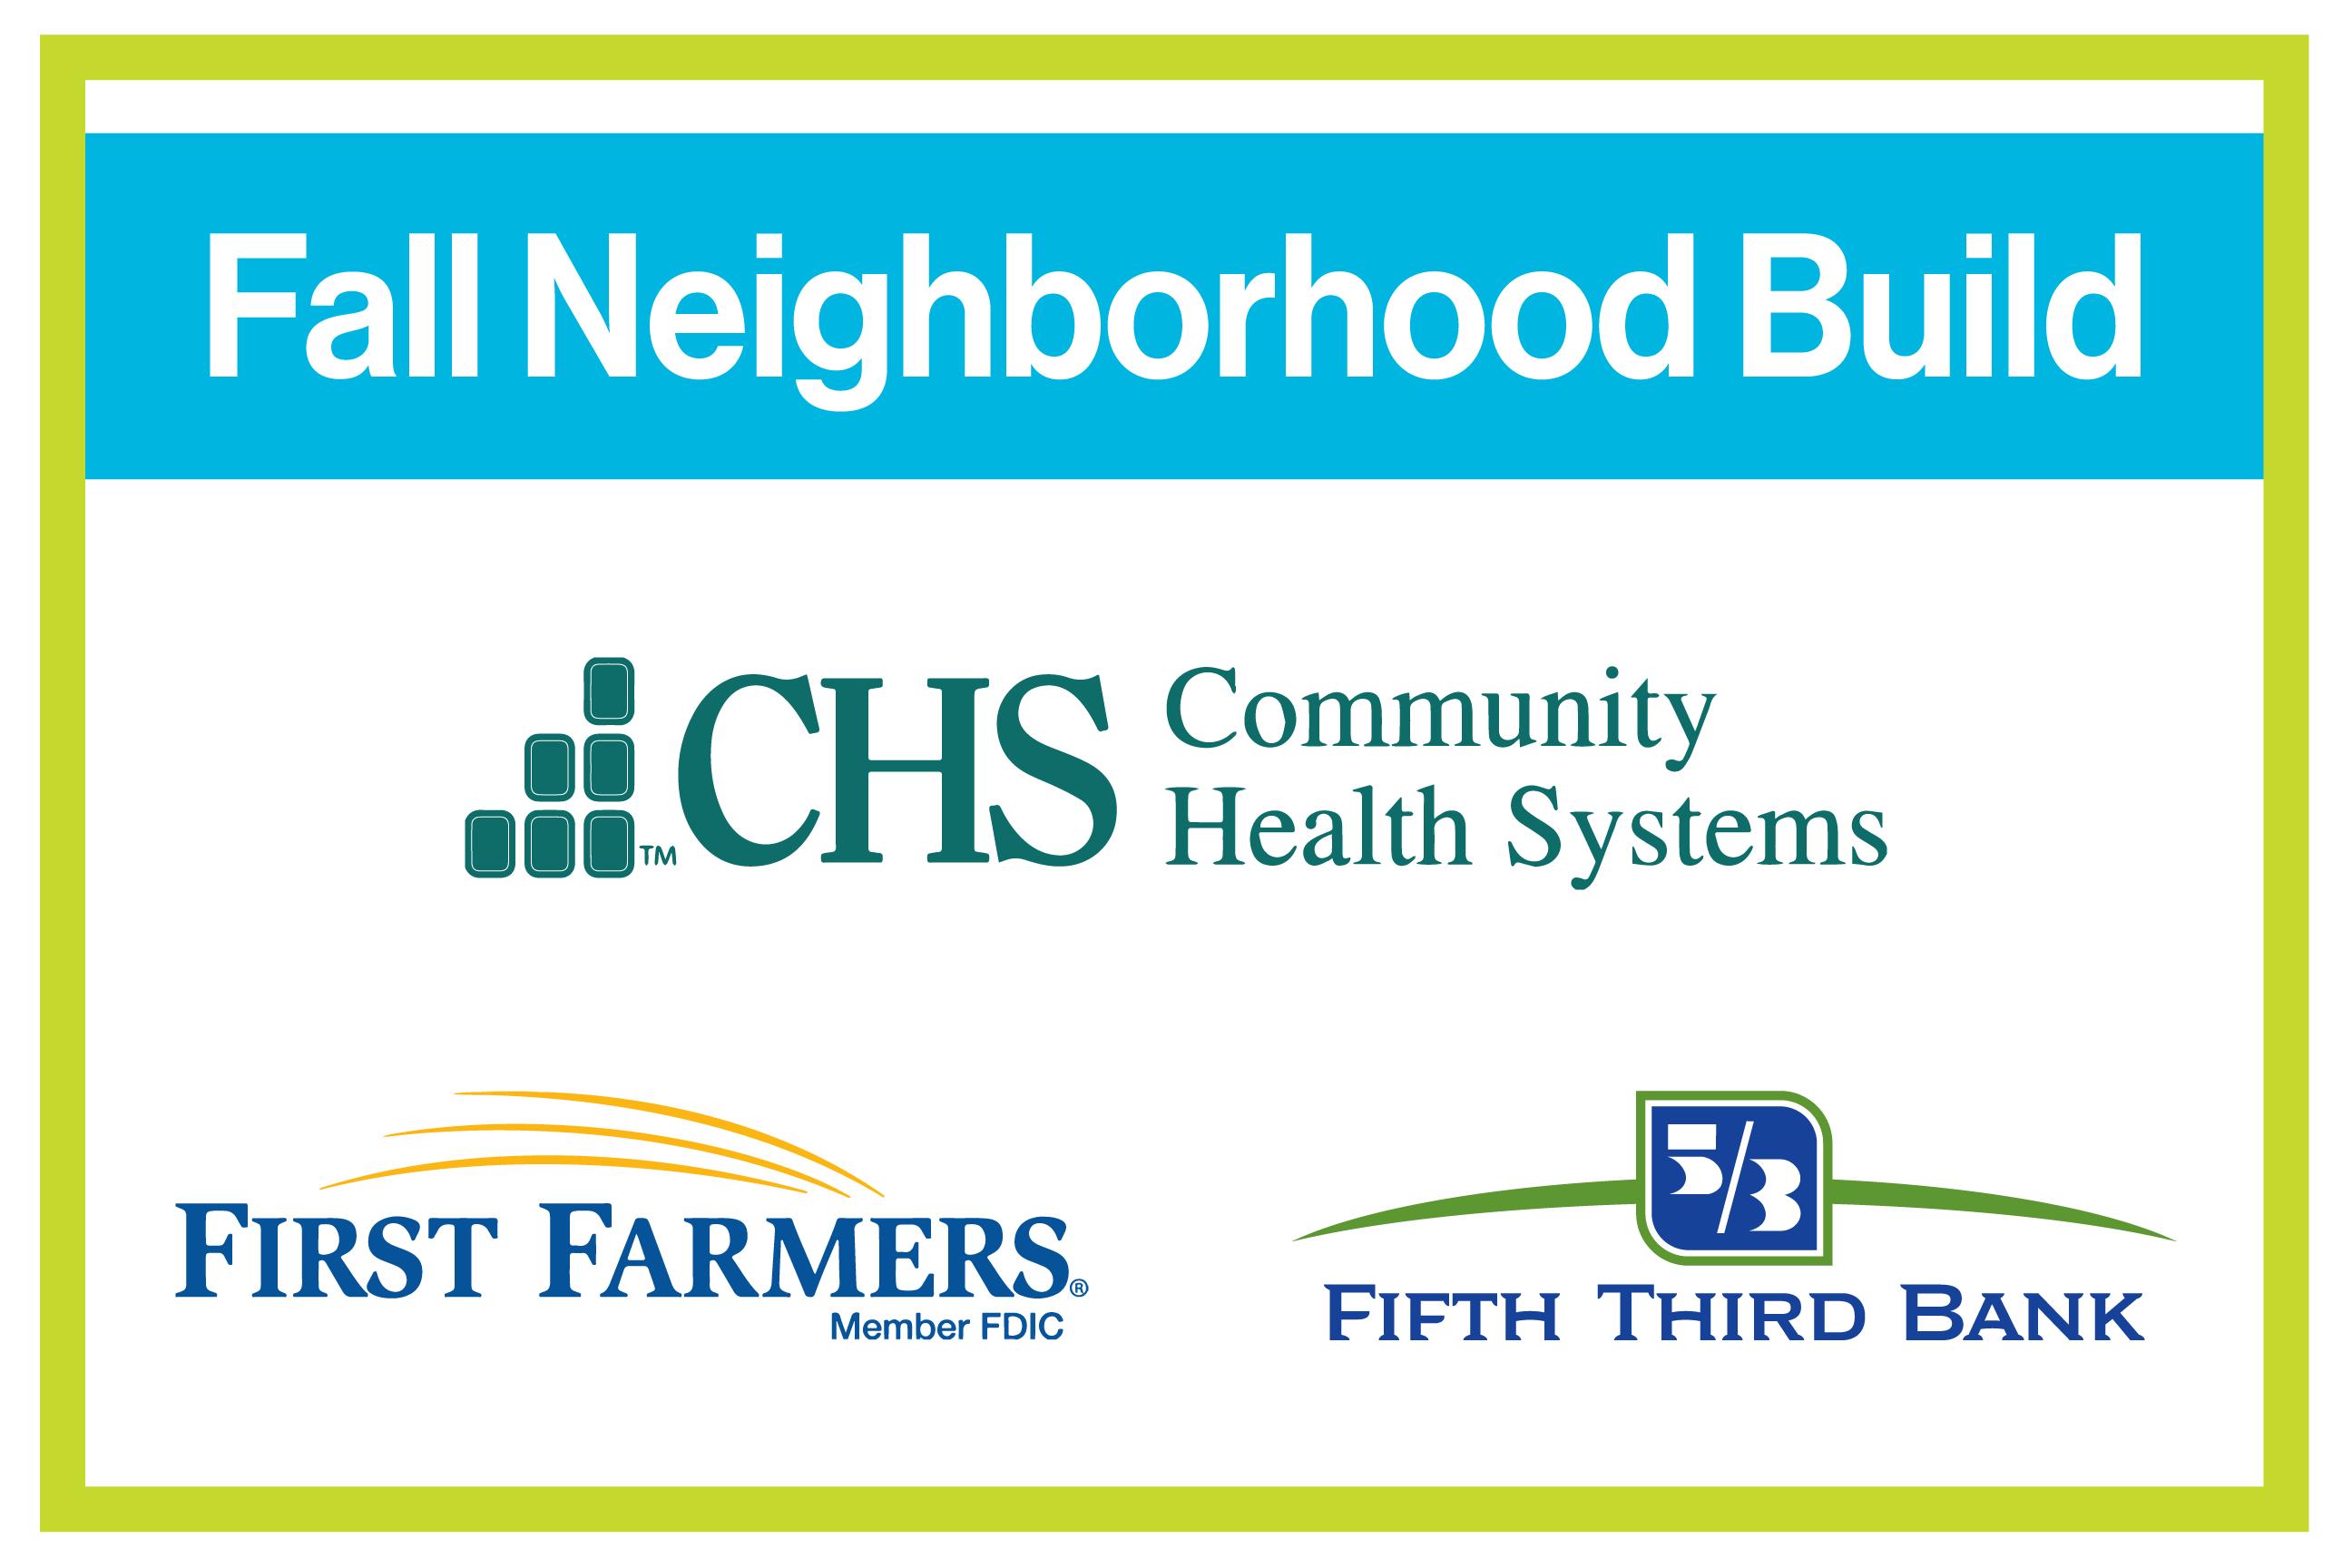 Fall Neighborhood Build